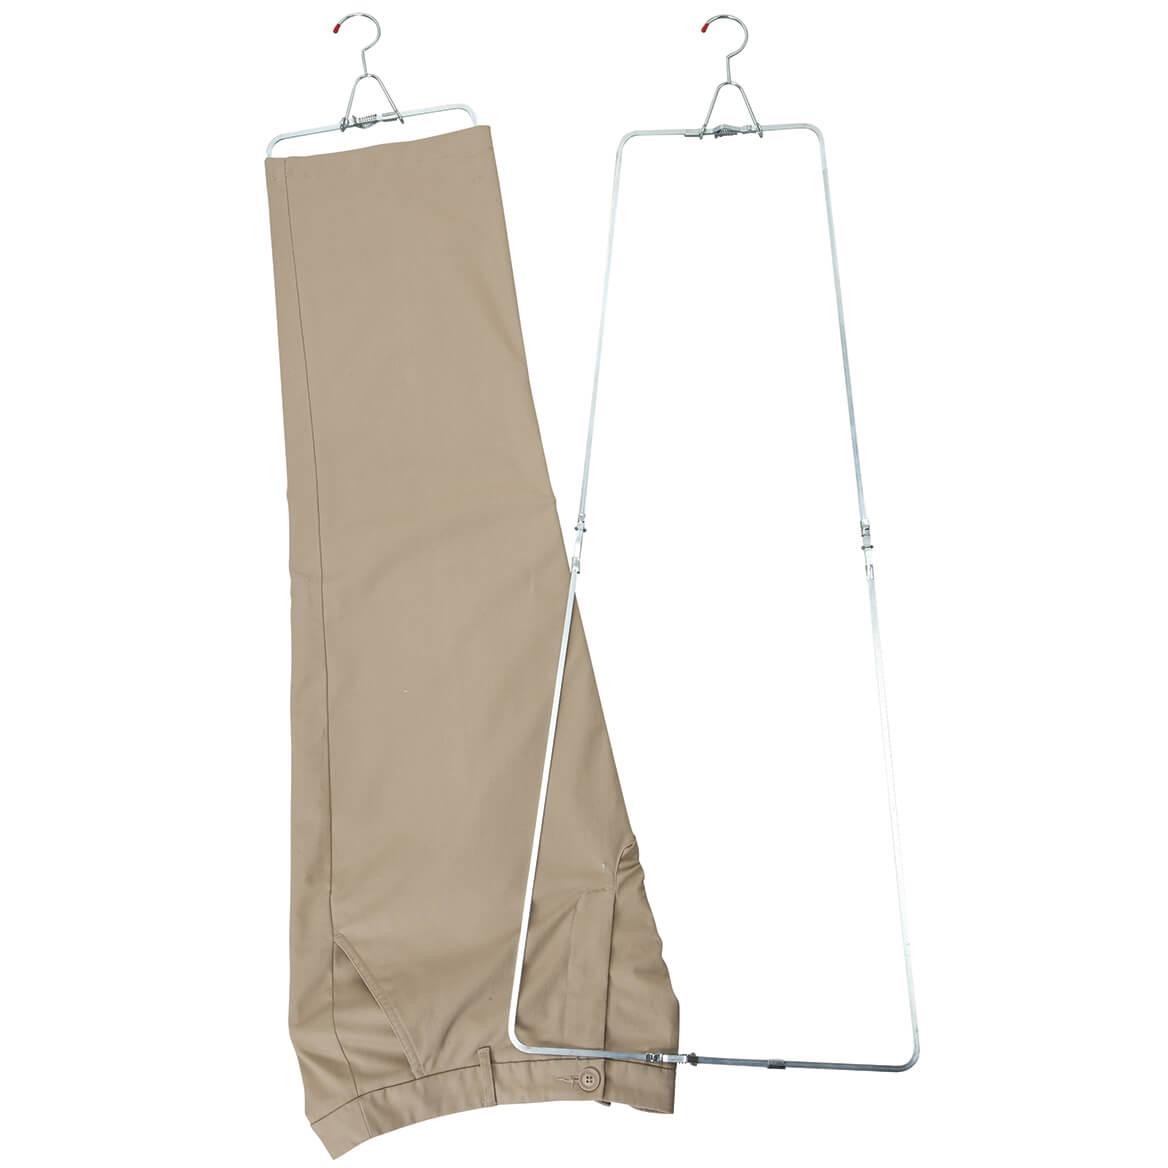 Pants Stretcher Set of 2-350213